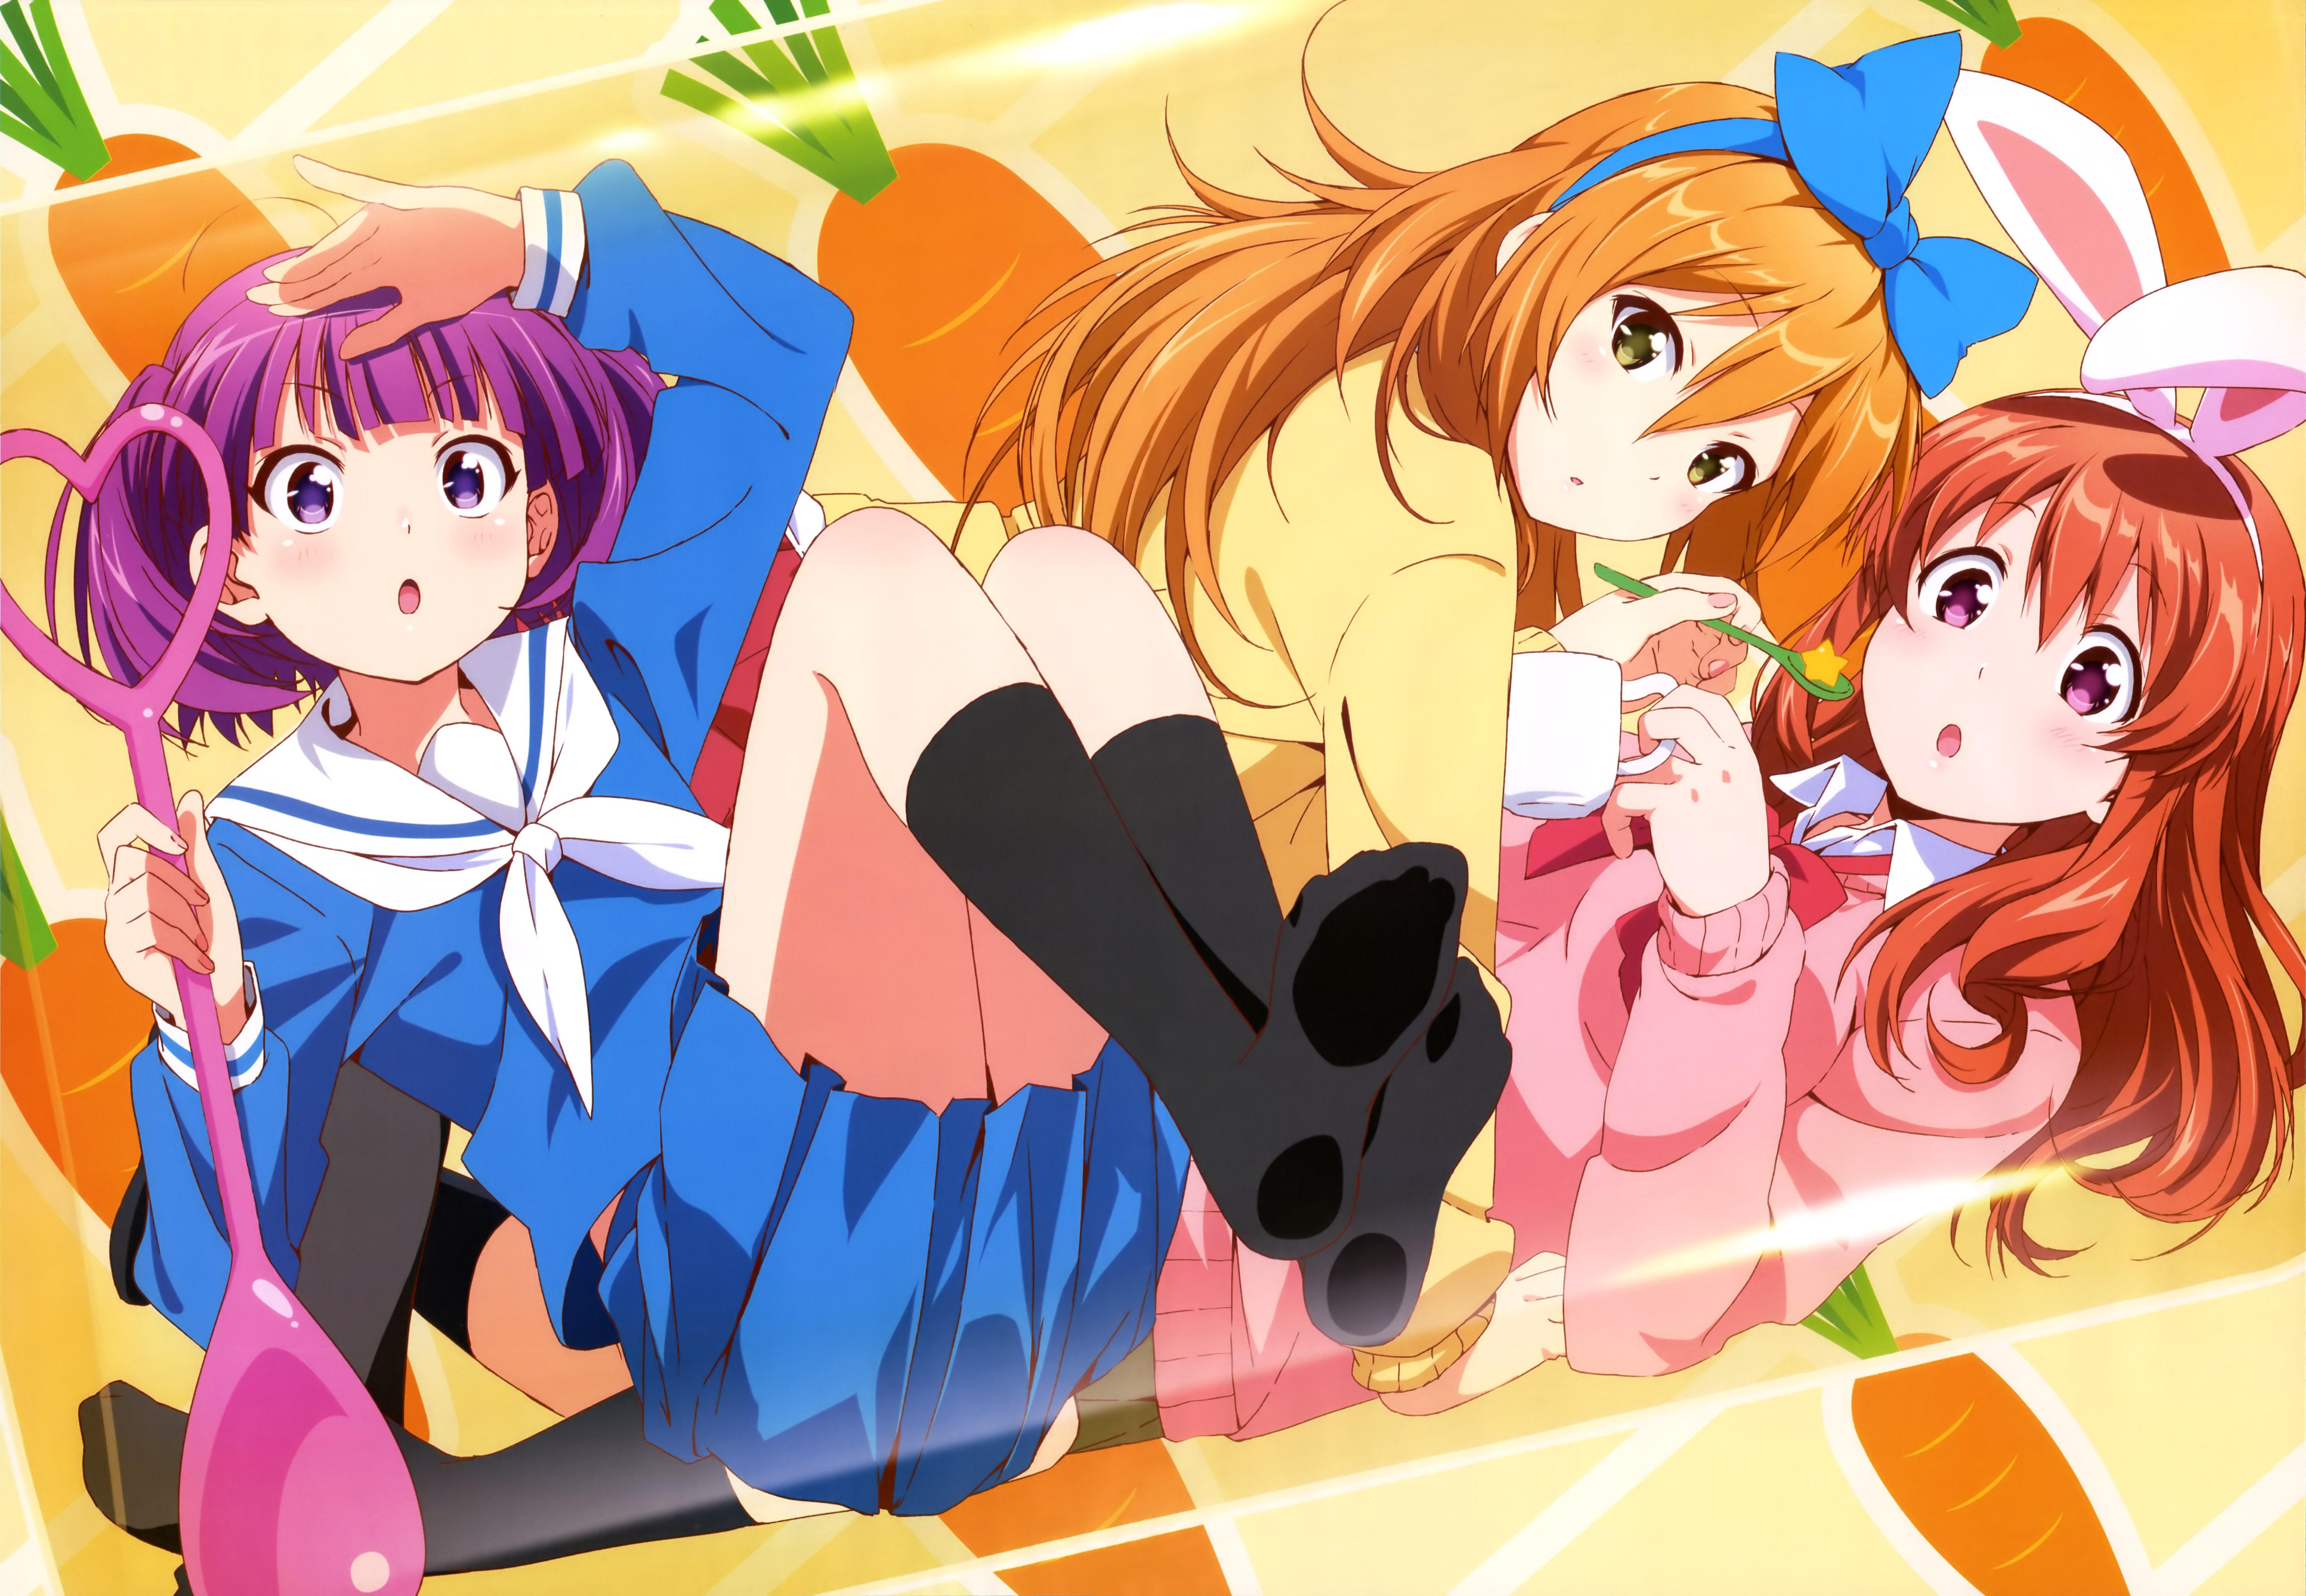 NyanType Magazine May 2015 anime posters koufuku graffiti machiko ryou morino kirin shiina poster